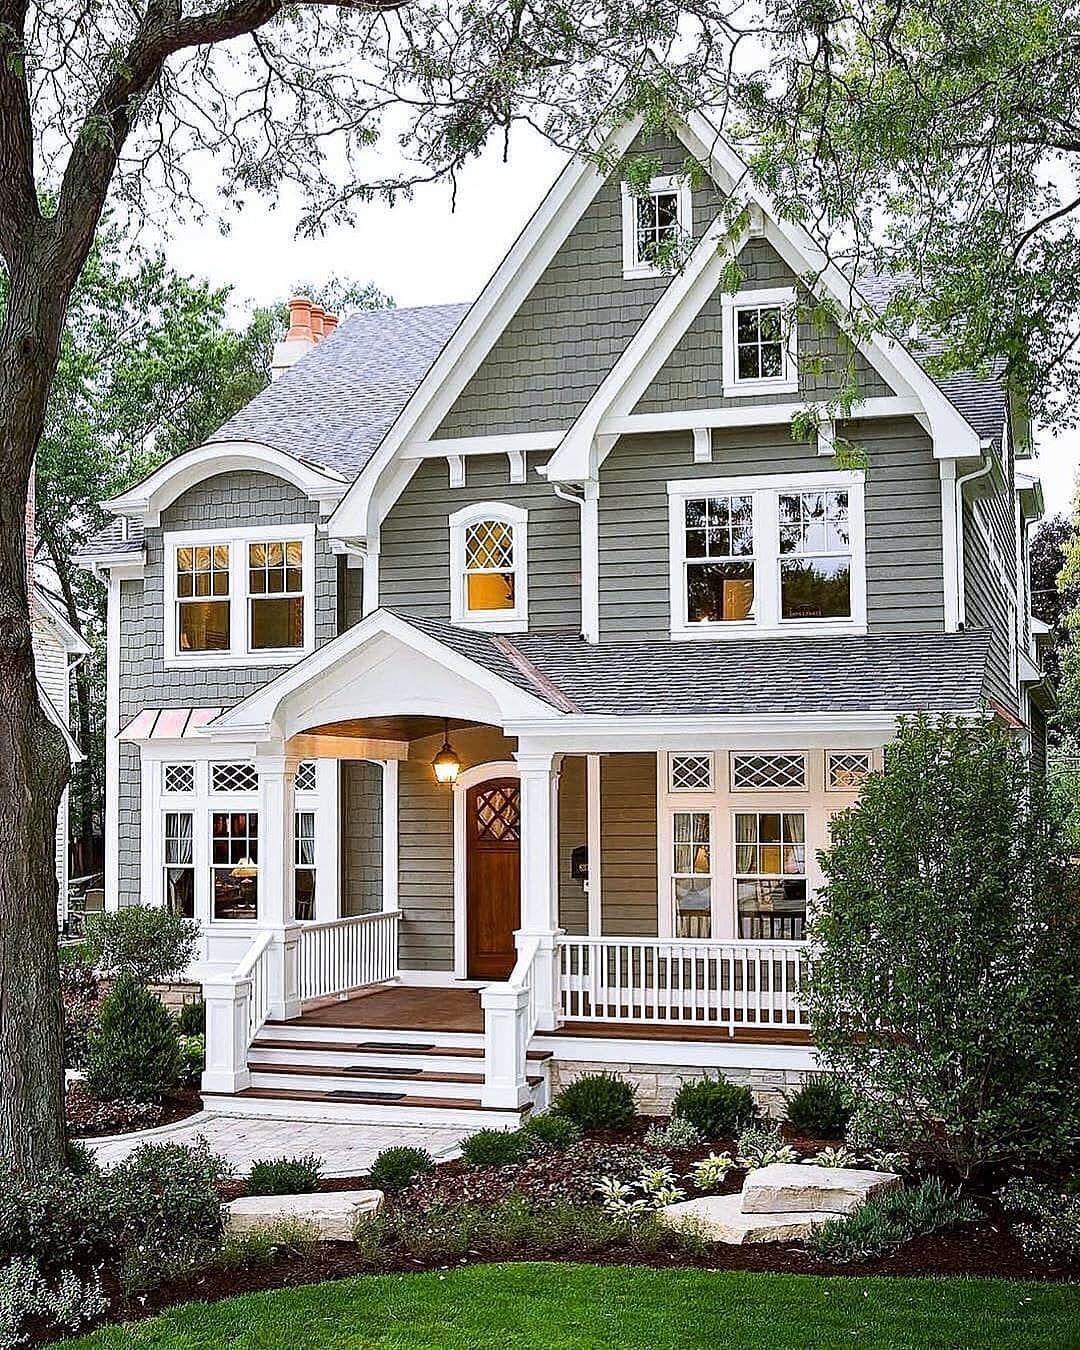 Inspiring Farmhouse Exterior Ideas In 2020 Cottage Style Homes Dream House Exterior House Exterior